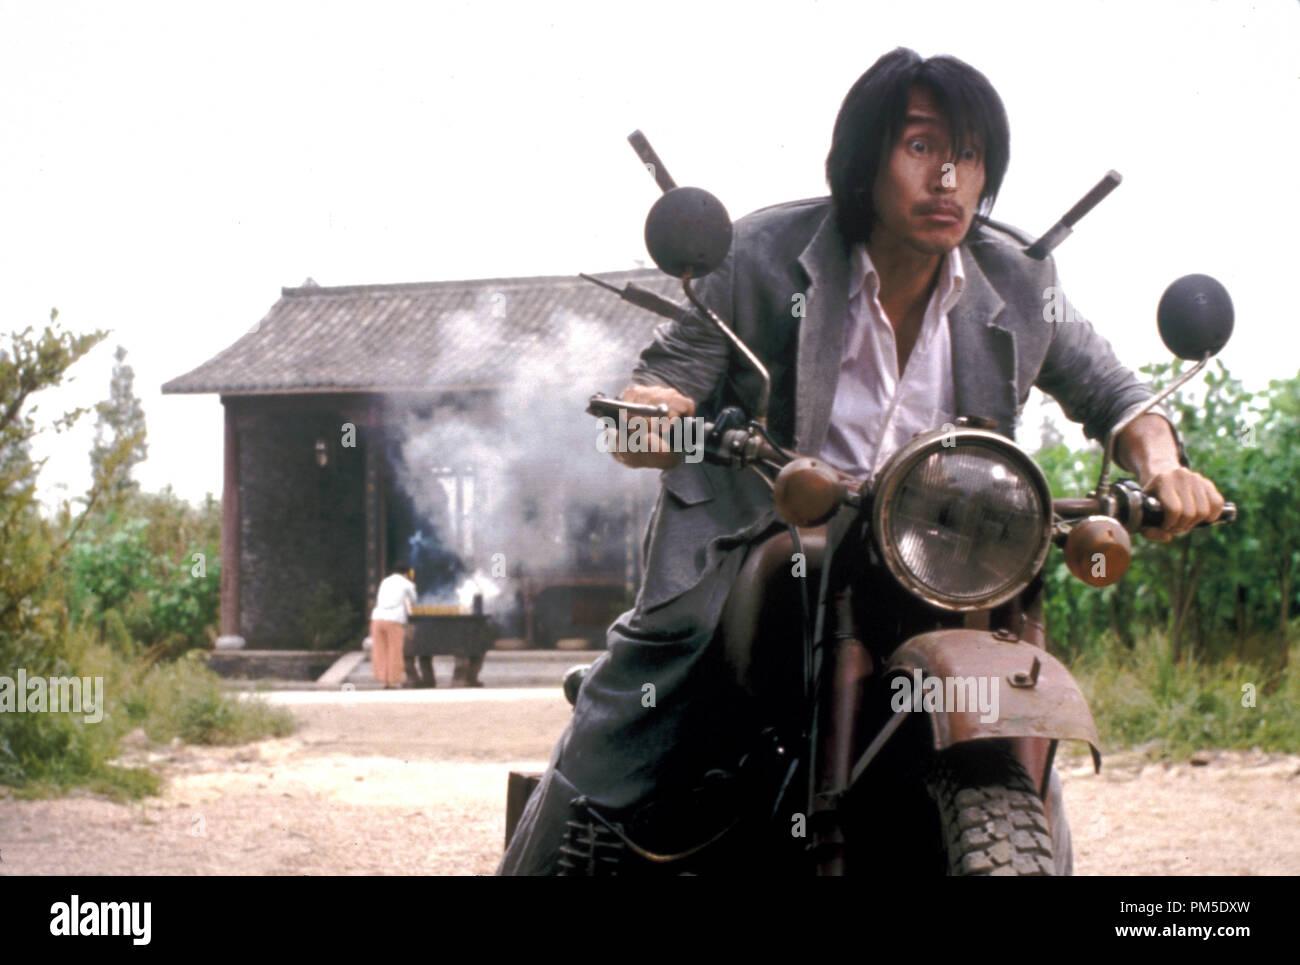 stephen chow download movie